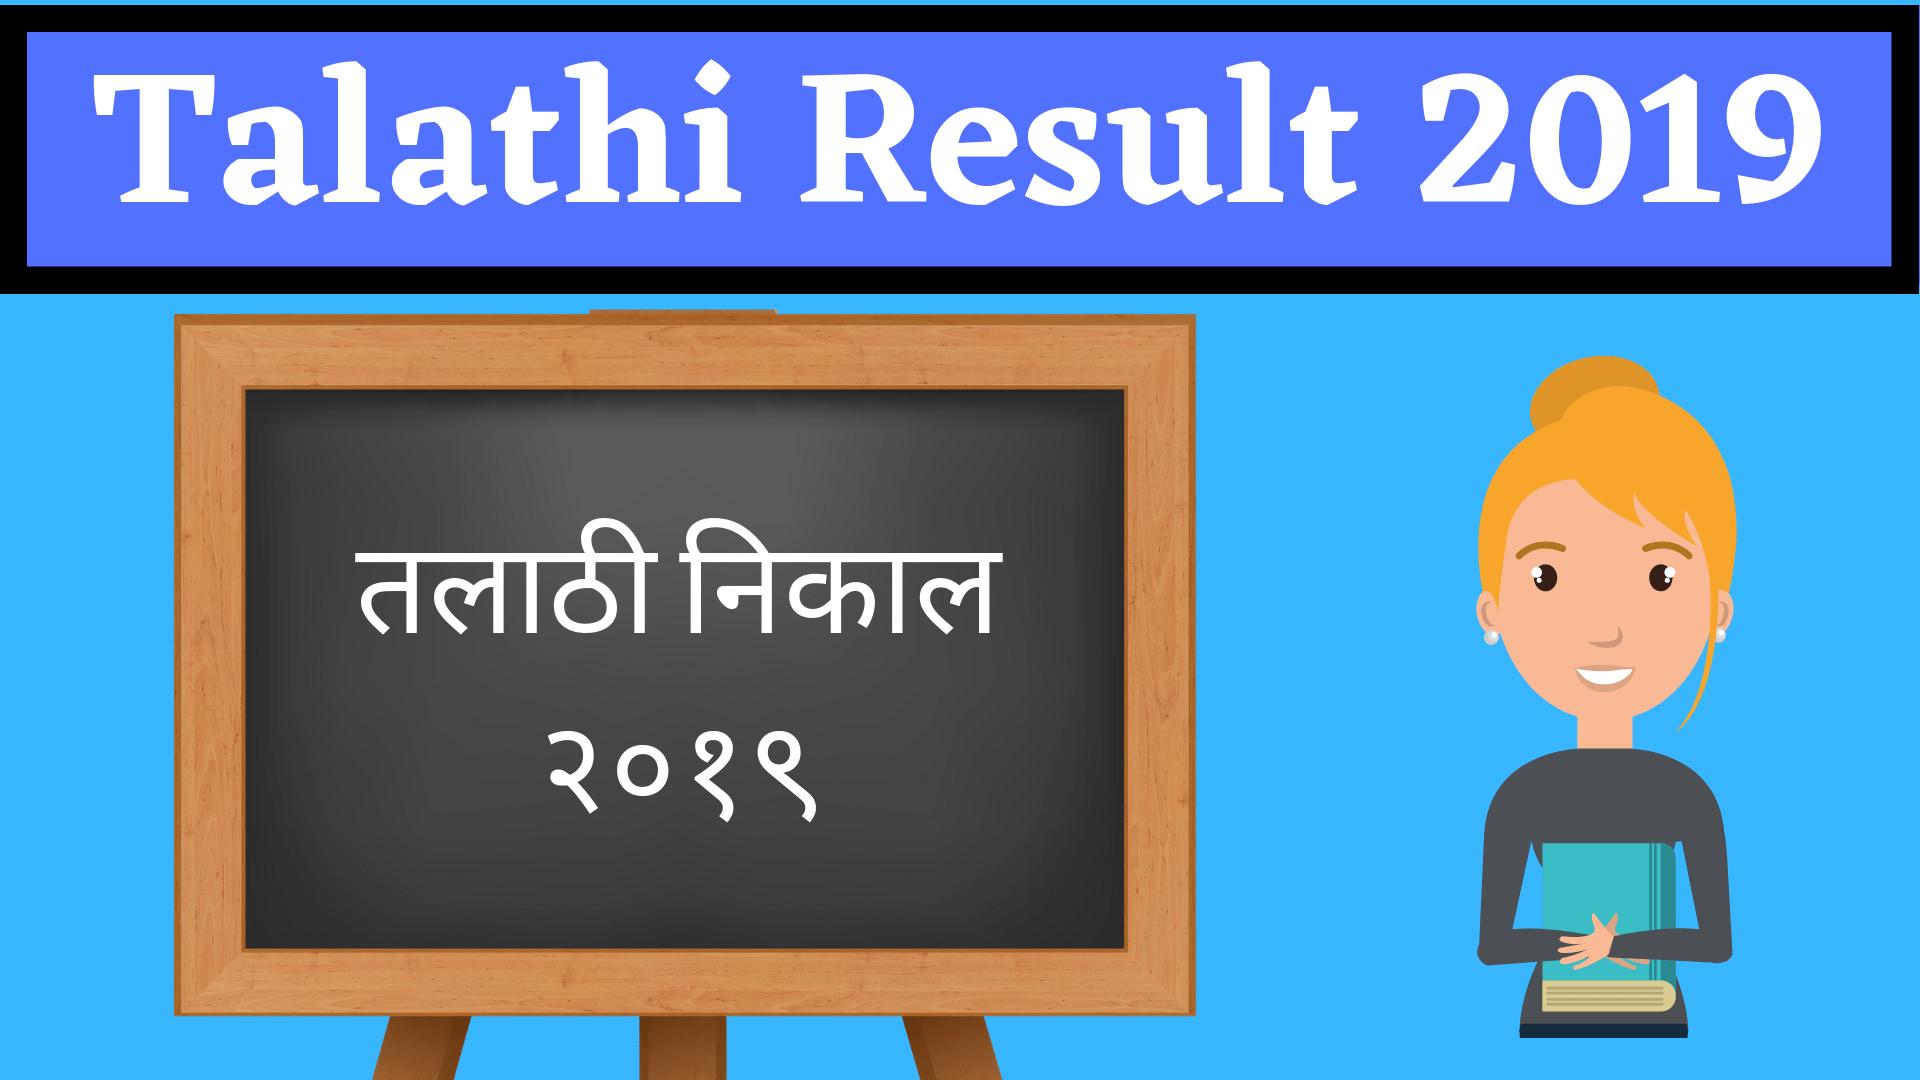 Maharashtra Talathi Result 2019 (Released) | Check RFD Maharashtra Cut Off Marks, Merit List